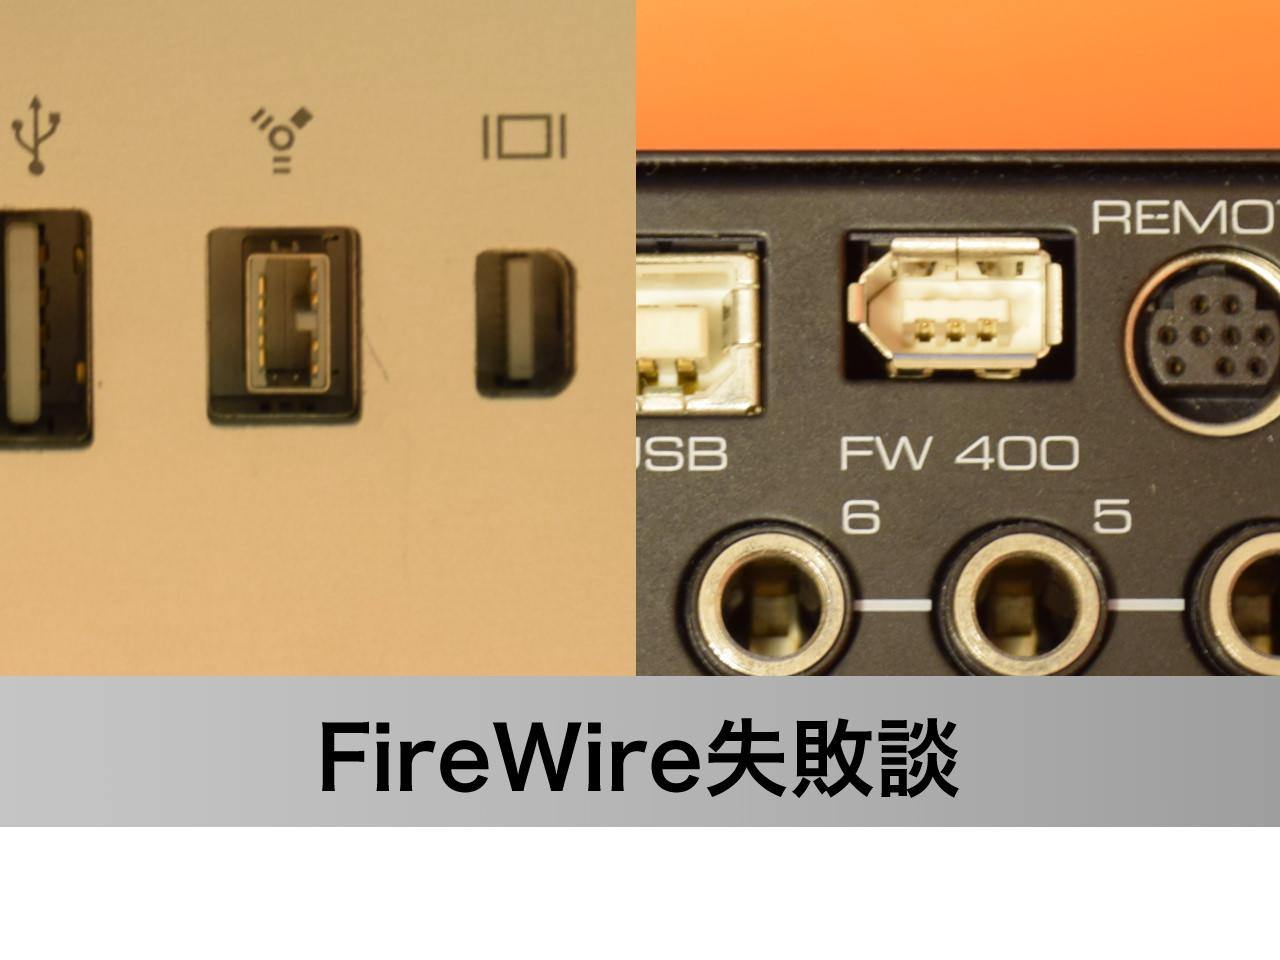 FireWire